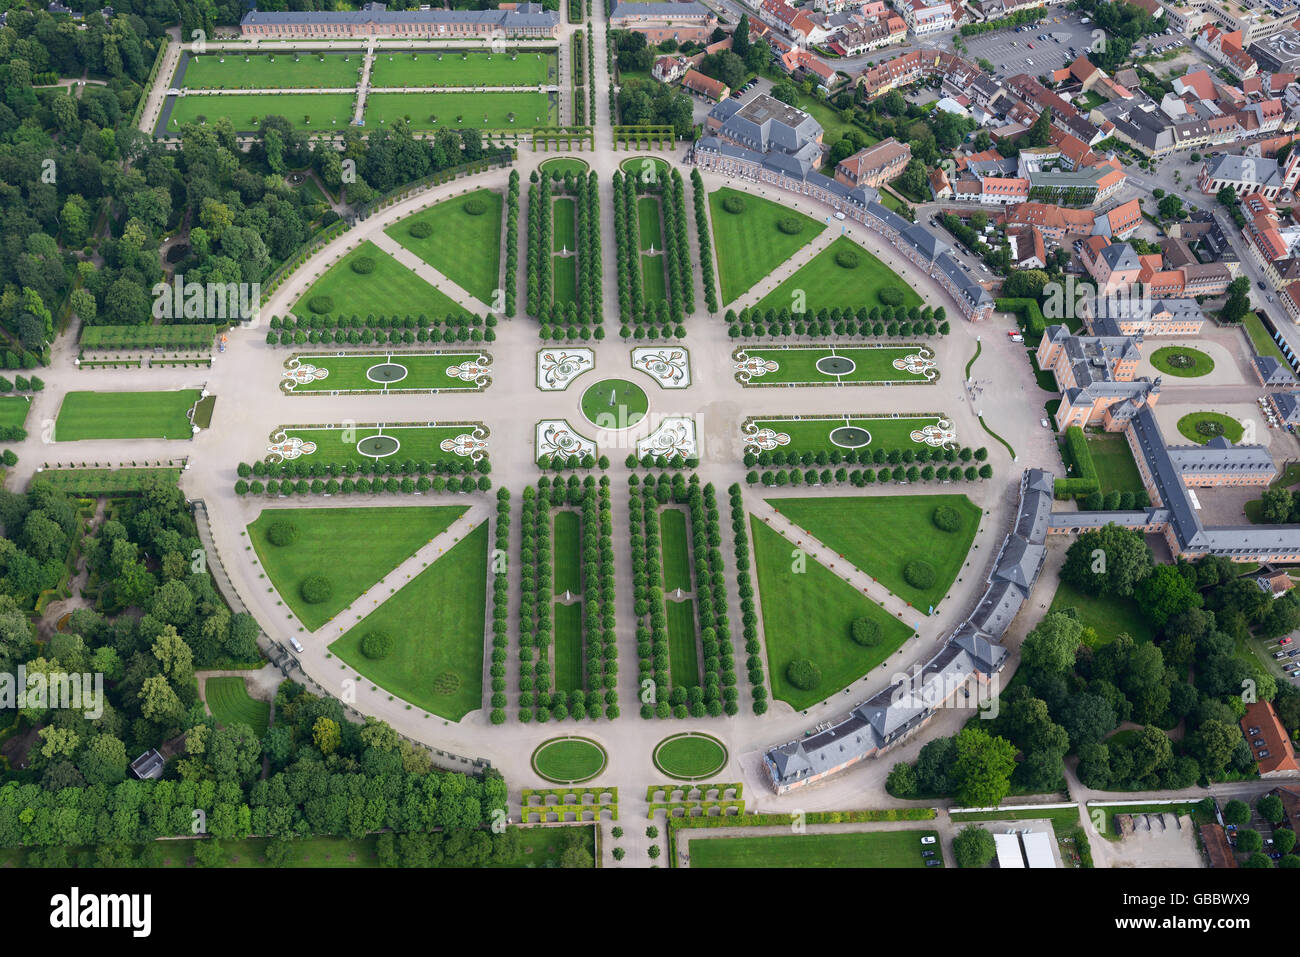 SCHWETZINGEN CASTLE & GARDEN (aerial view). Schwetzingen, Baden-Wurttemberg, Germany. - Stock Image